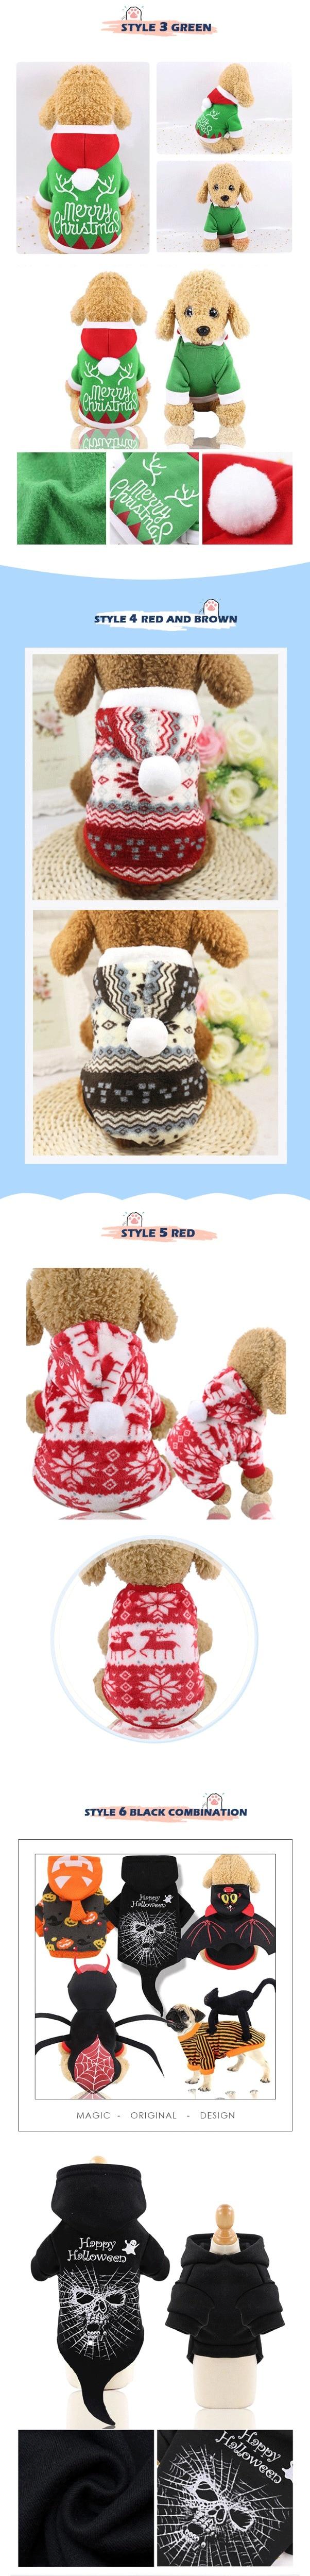 dog clothes for christmas (12)